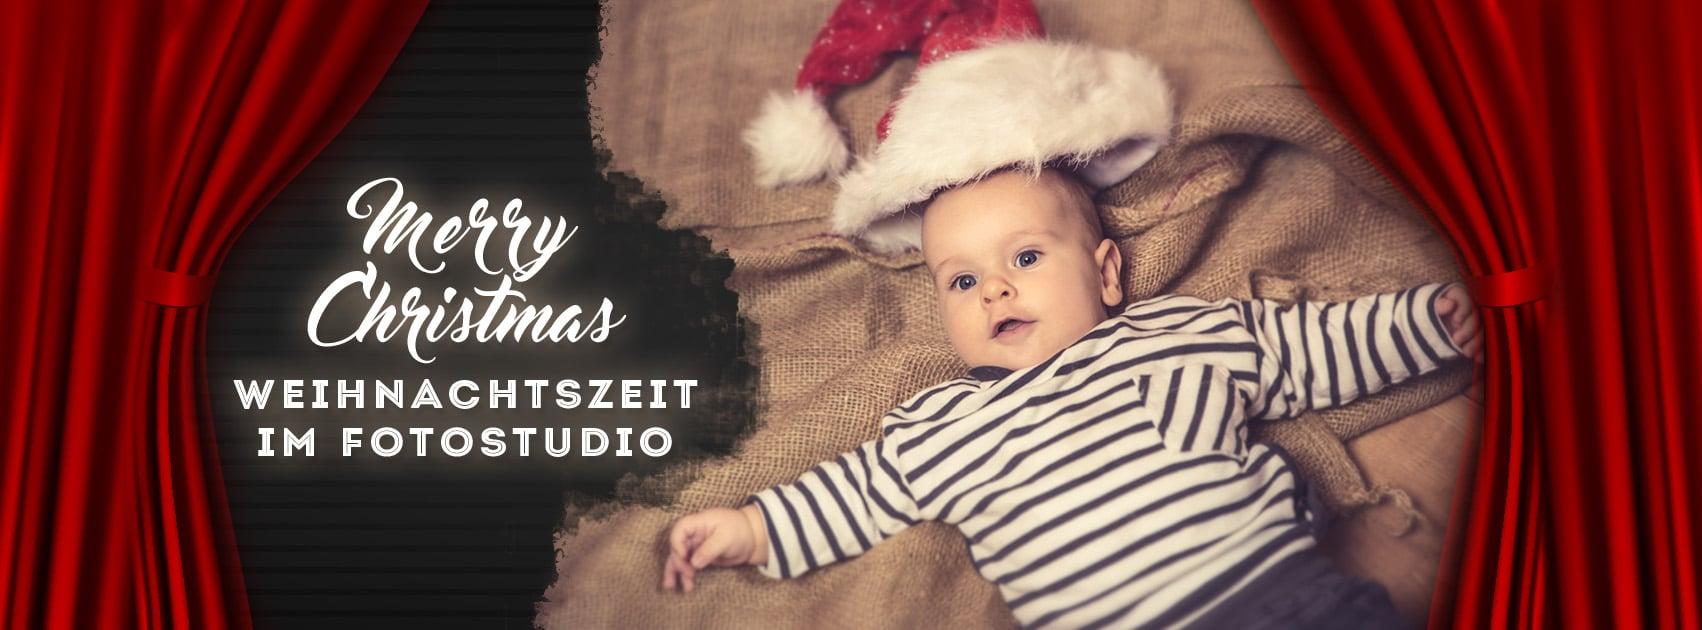 fotostudio dortmund witten fotoshootings familie weihnachten